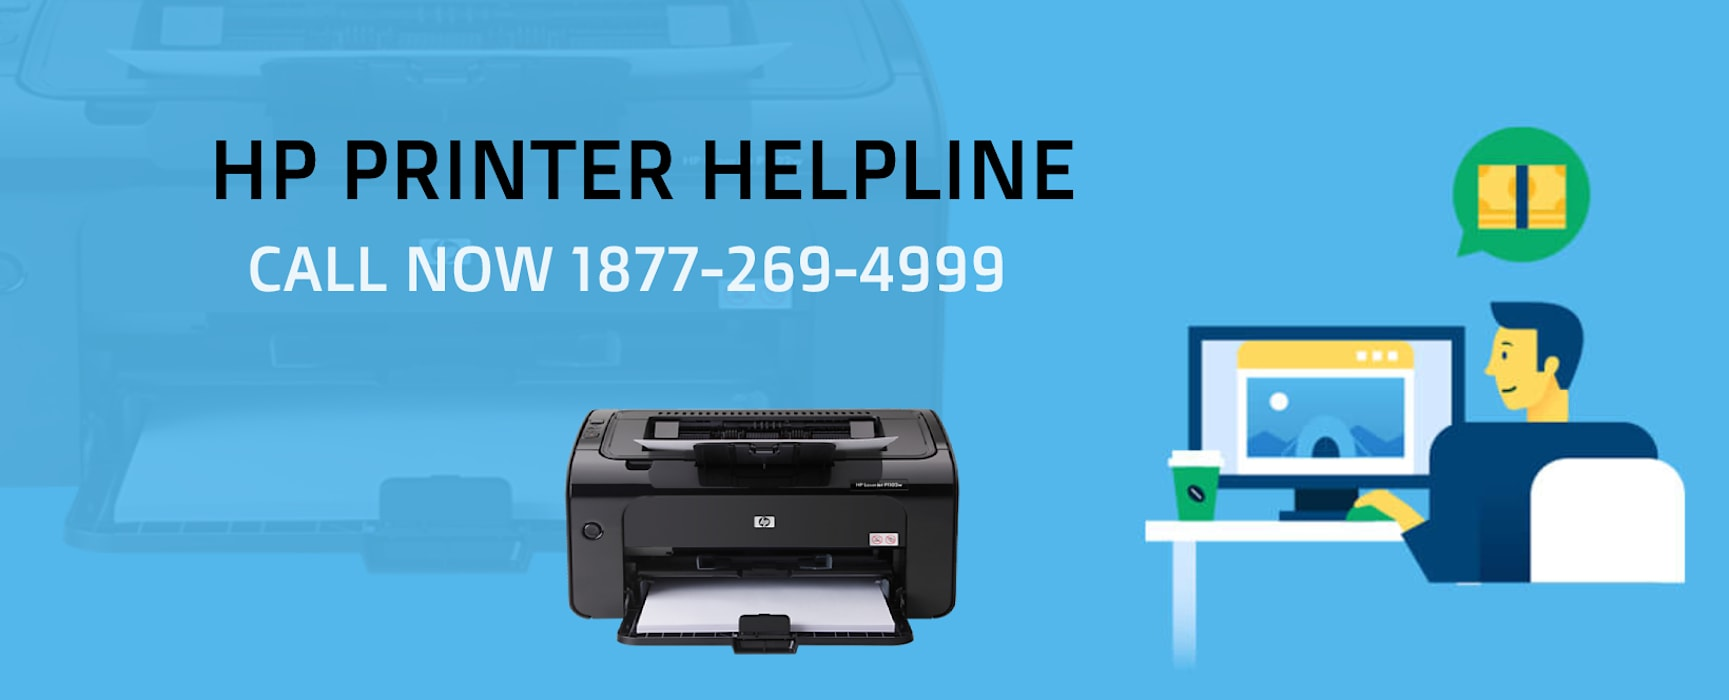 HP Printer Customer care Number 1877-269-4999 HP Printer Customer Care Number 1877-269-4999 Offices & stores Aluminium/Zinc Black